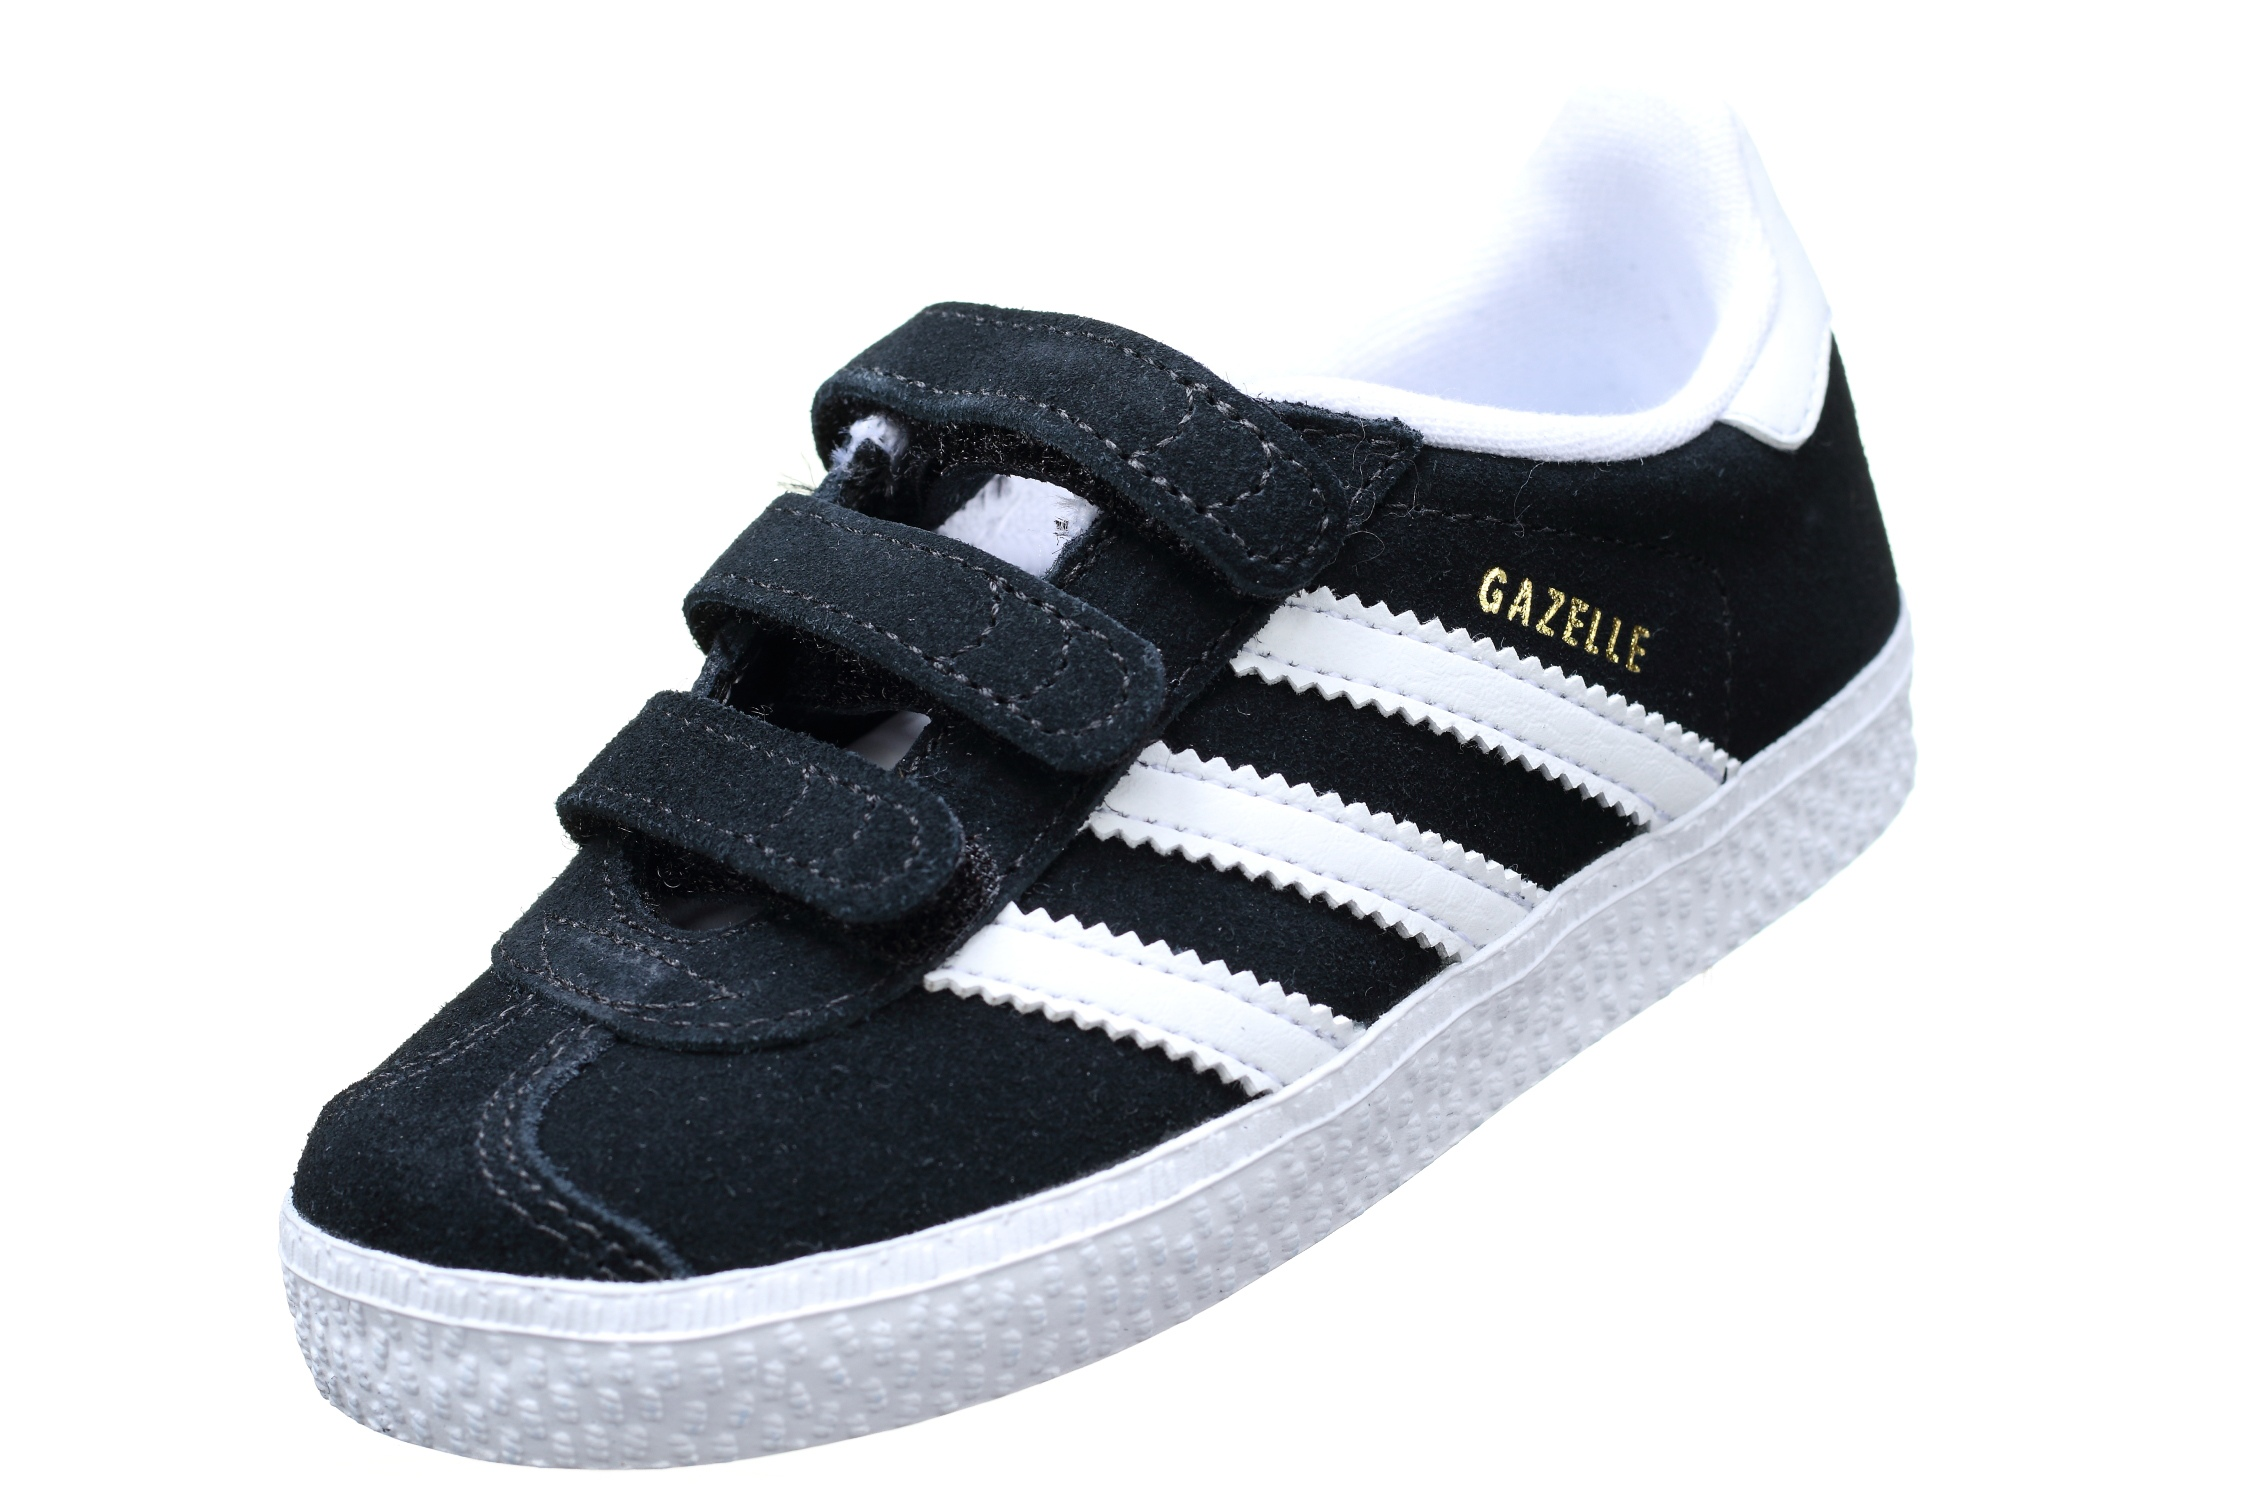 https://www.leadermode.com/156884/adidas-gazelle-cf-i-cq3139-black.jpg